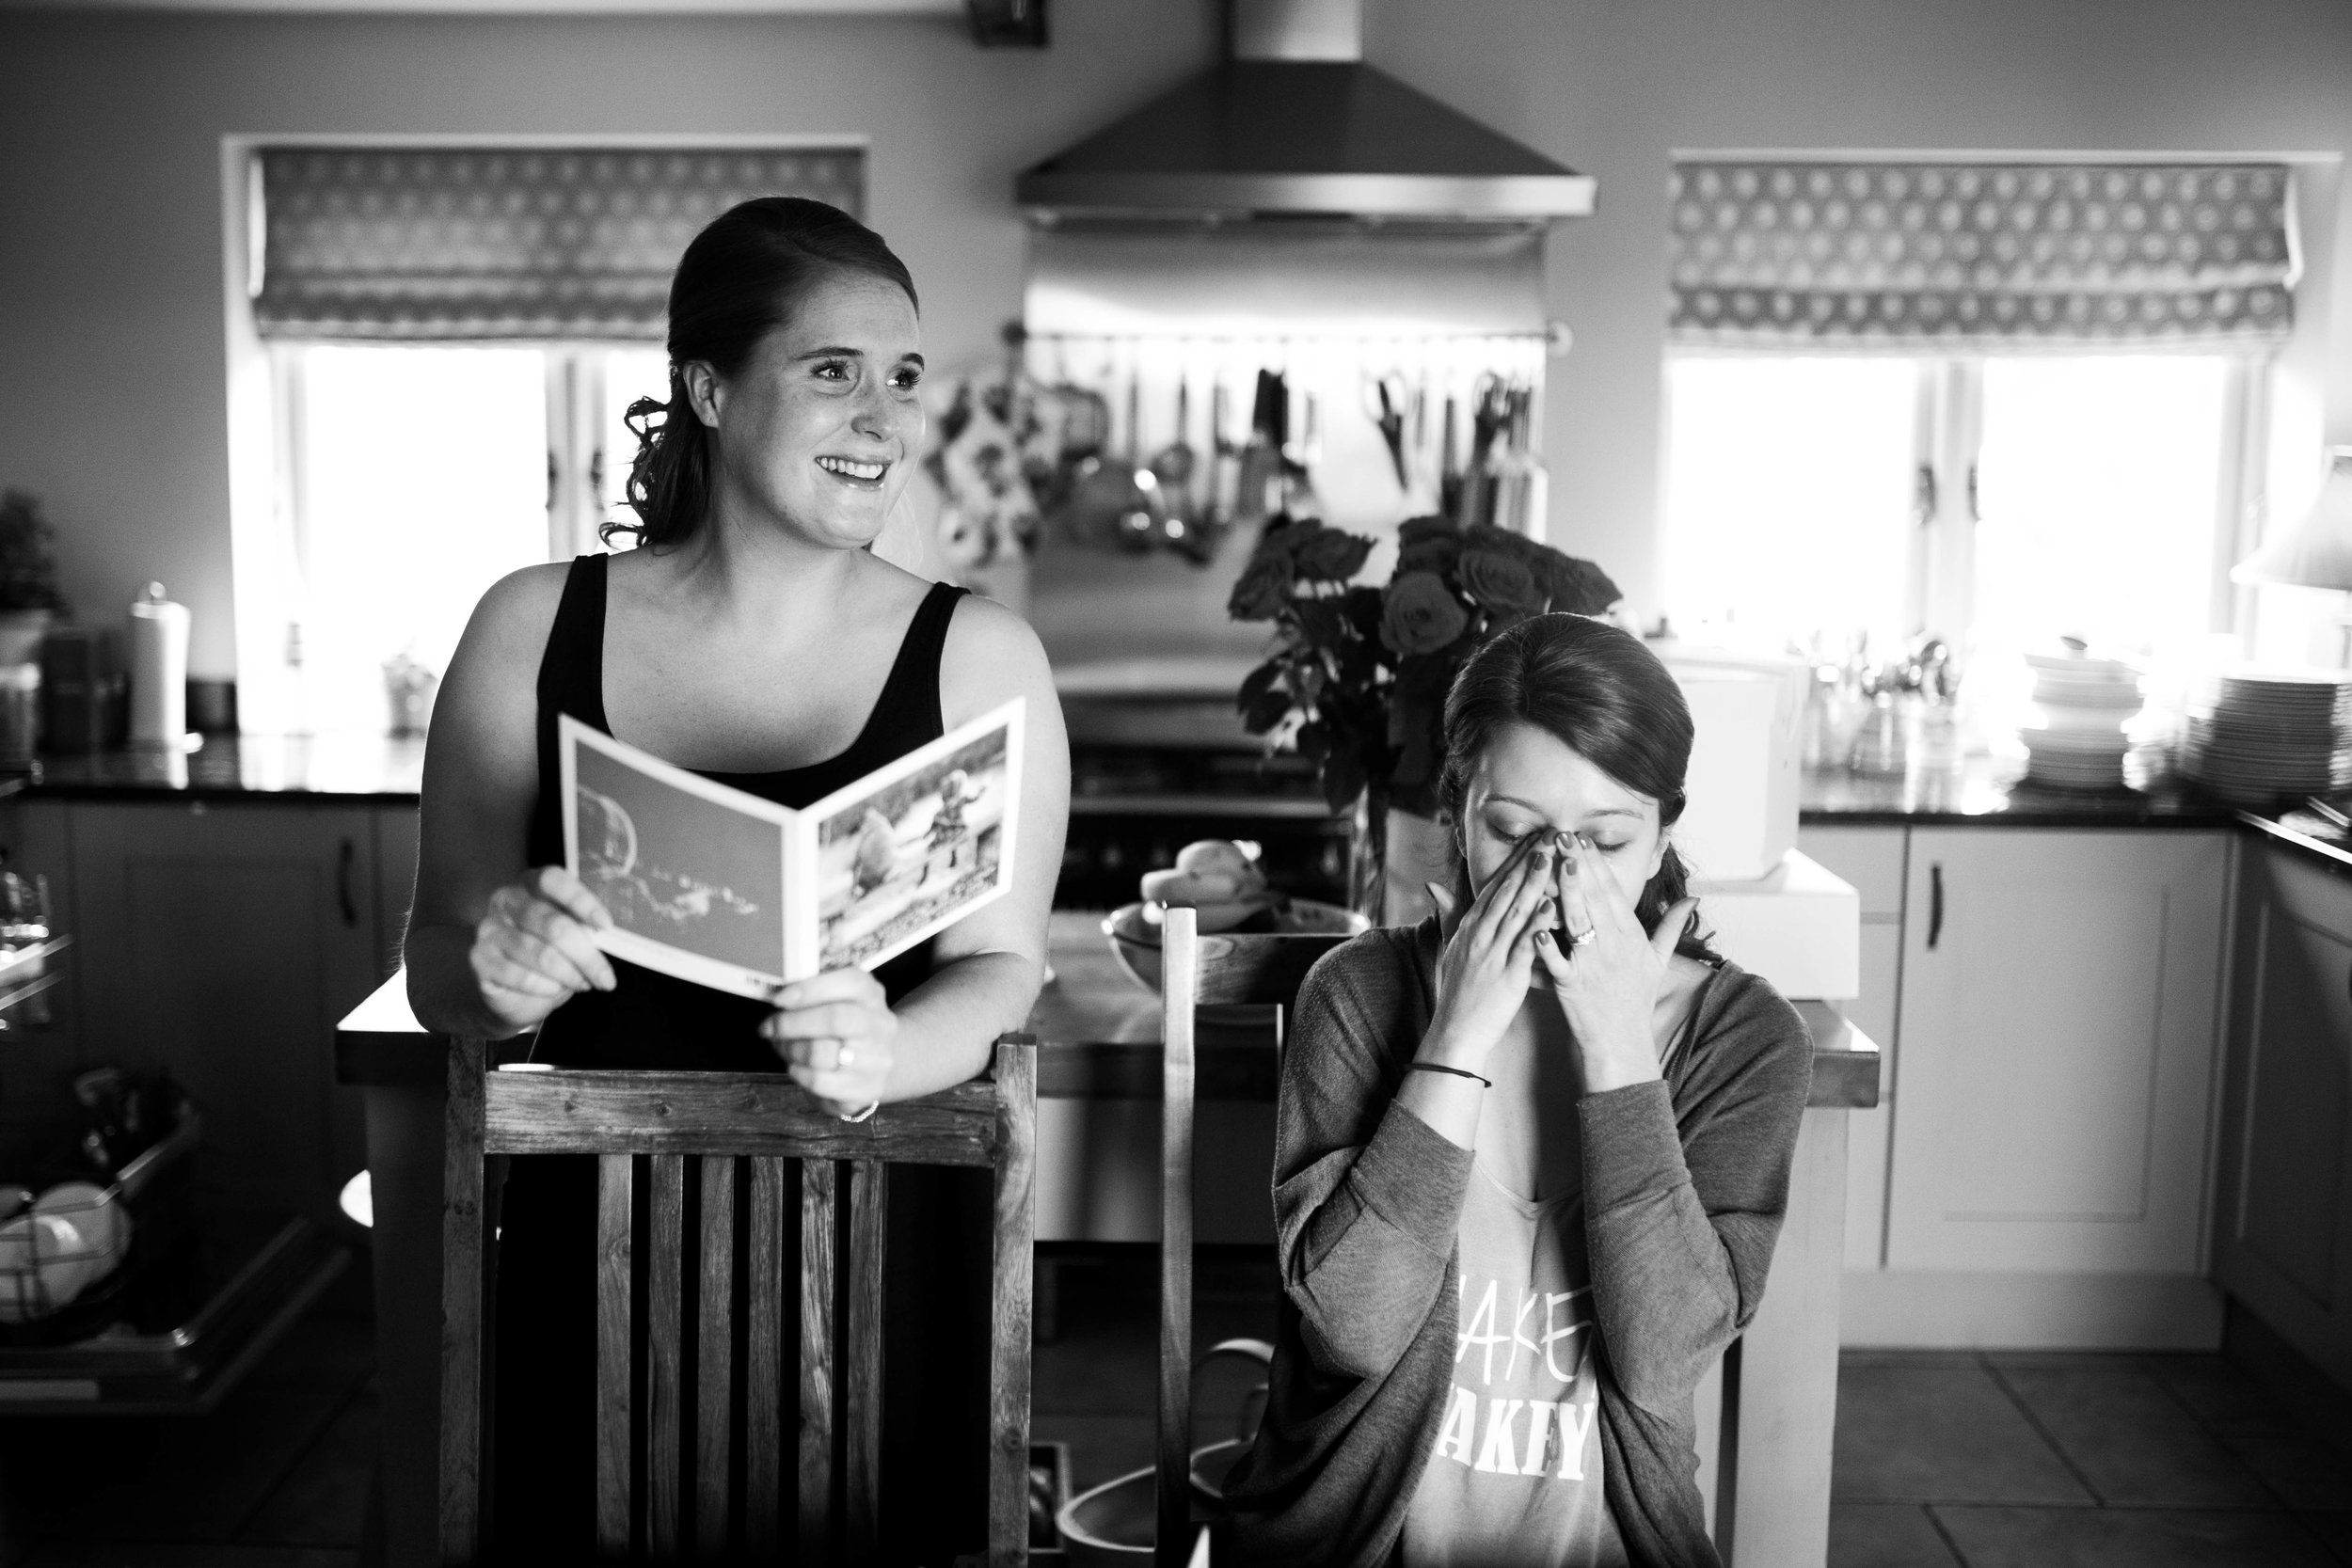 Notley_Abbey_Nick_Labrum_Photo_Kate&Matt_black and white-74.jpg